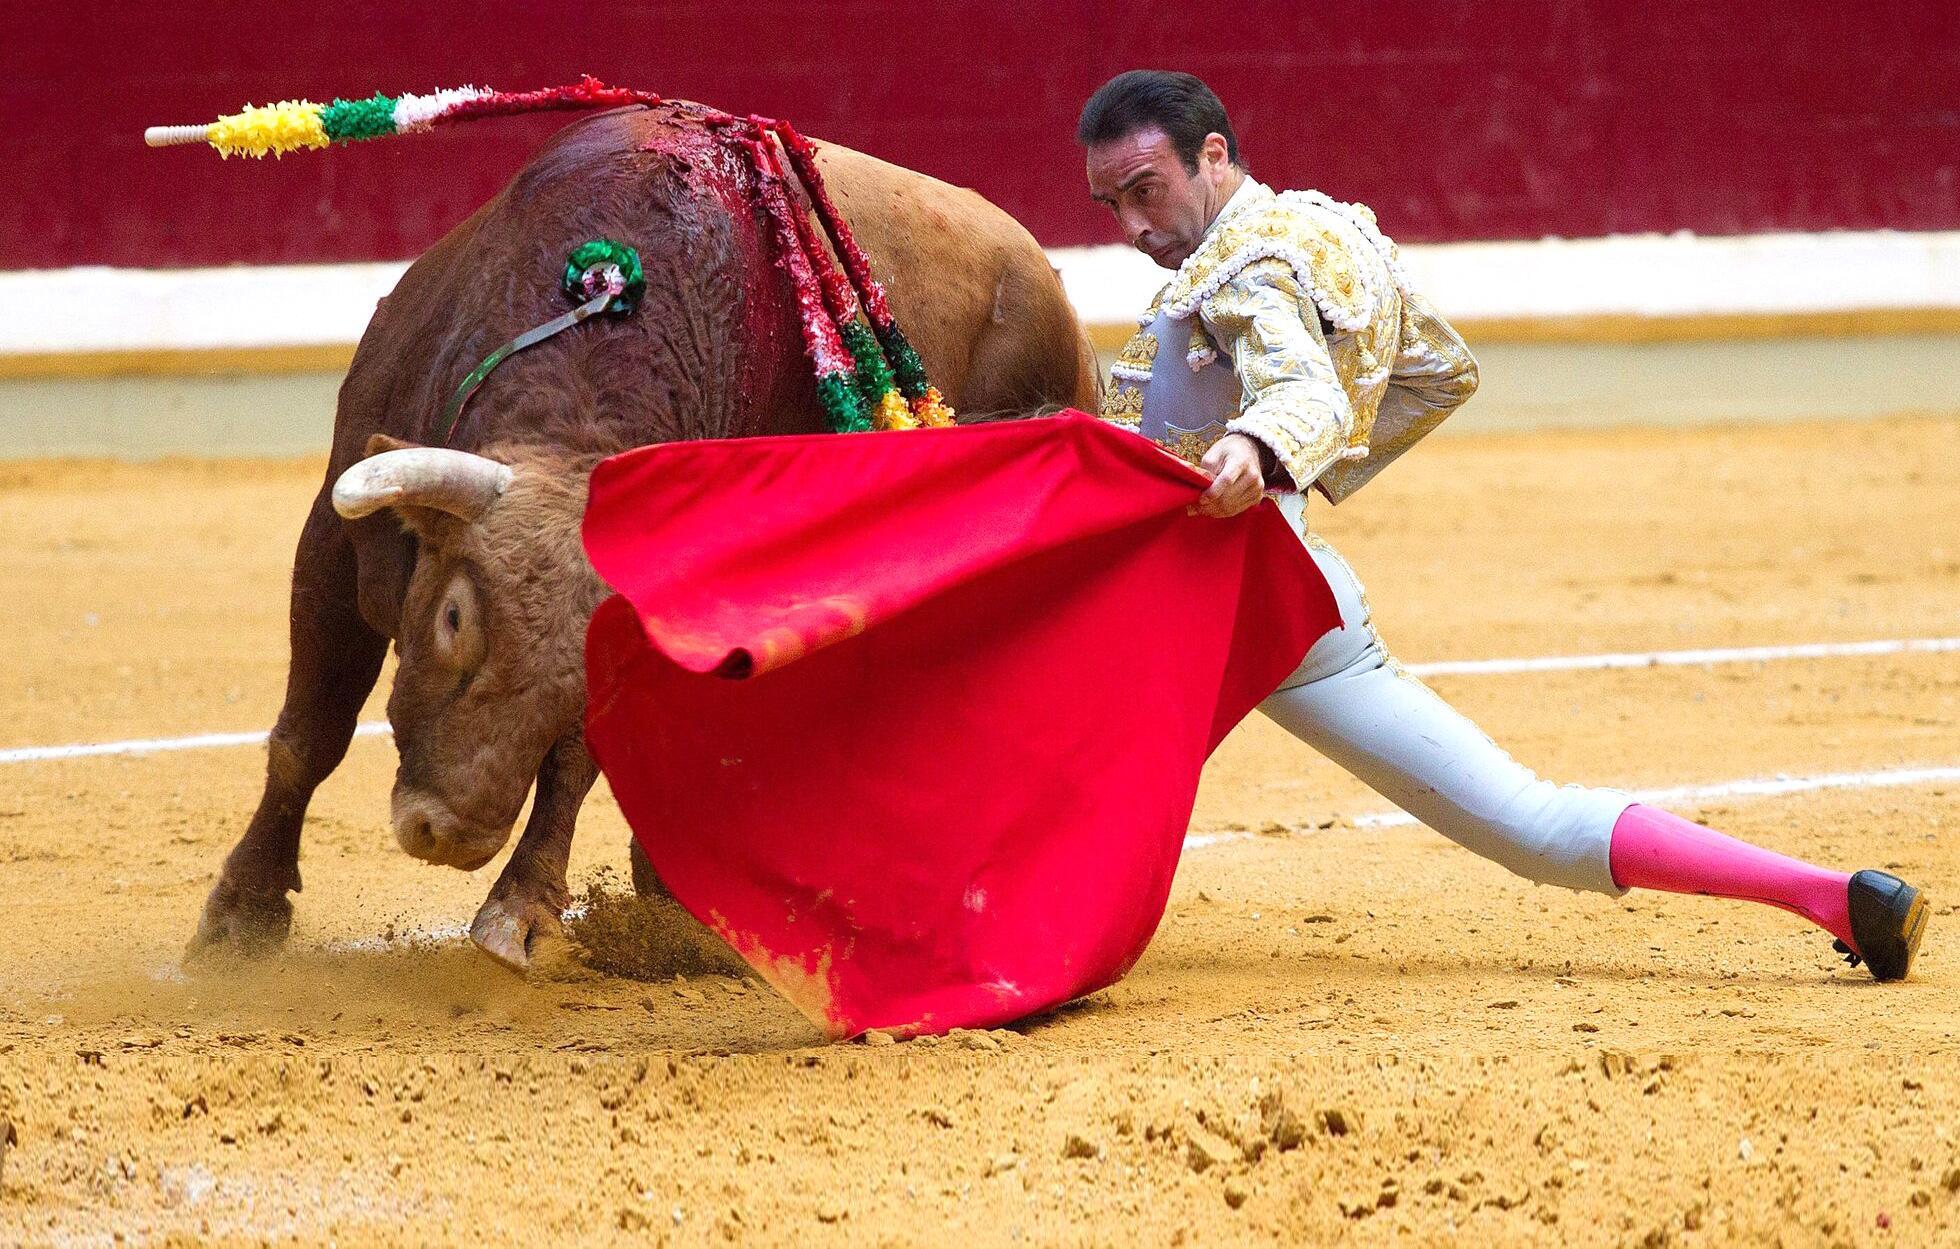 Bild zu Enrique Ponce, Torero, Stierkampf, Arena, San Mateos